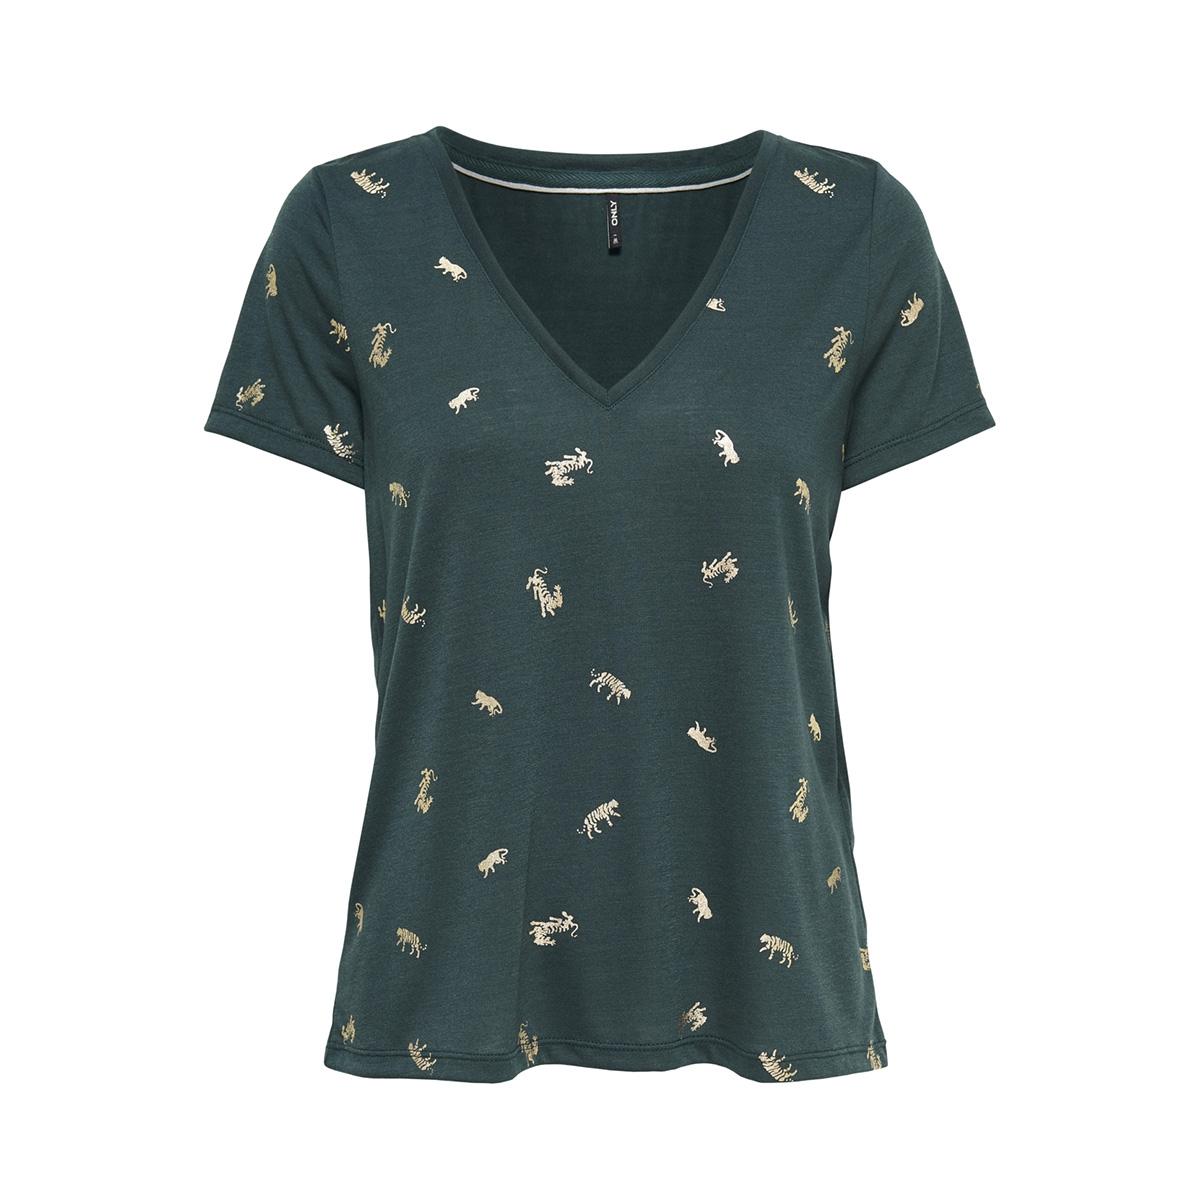 onlisabella s/s sensei aop box jrs 15168498 only t-shirt green gables/ tigers